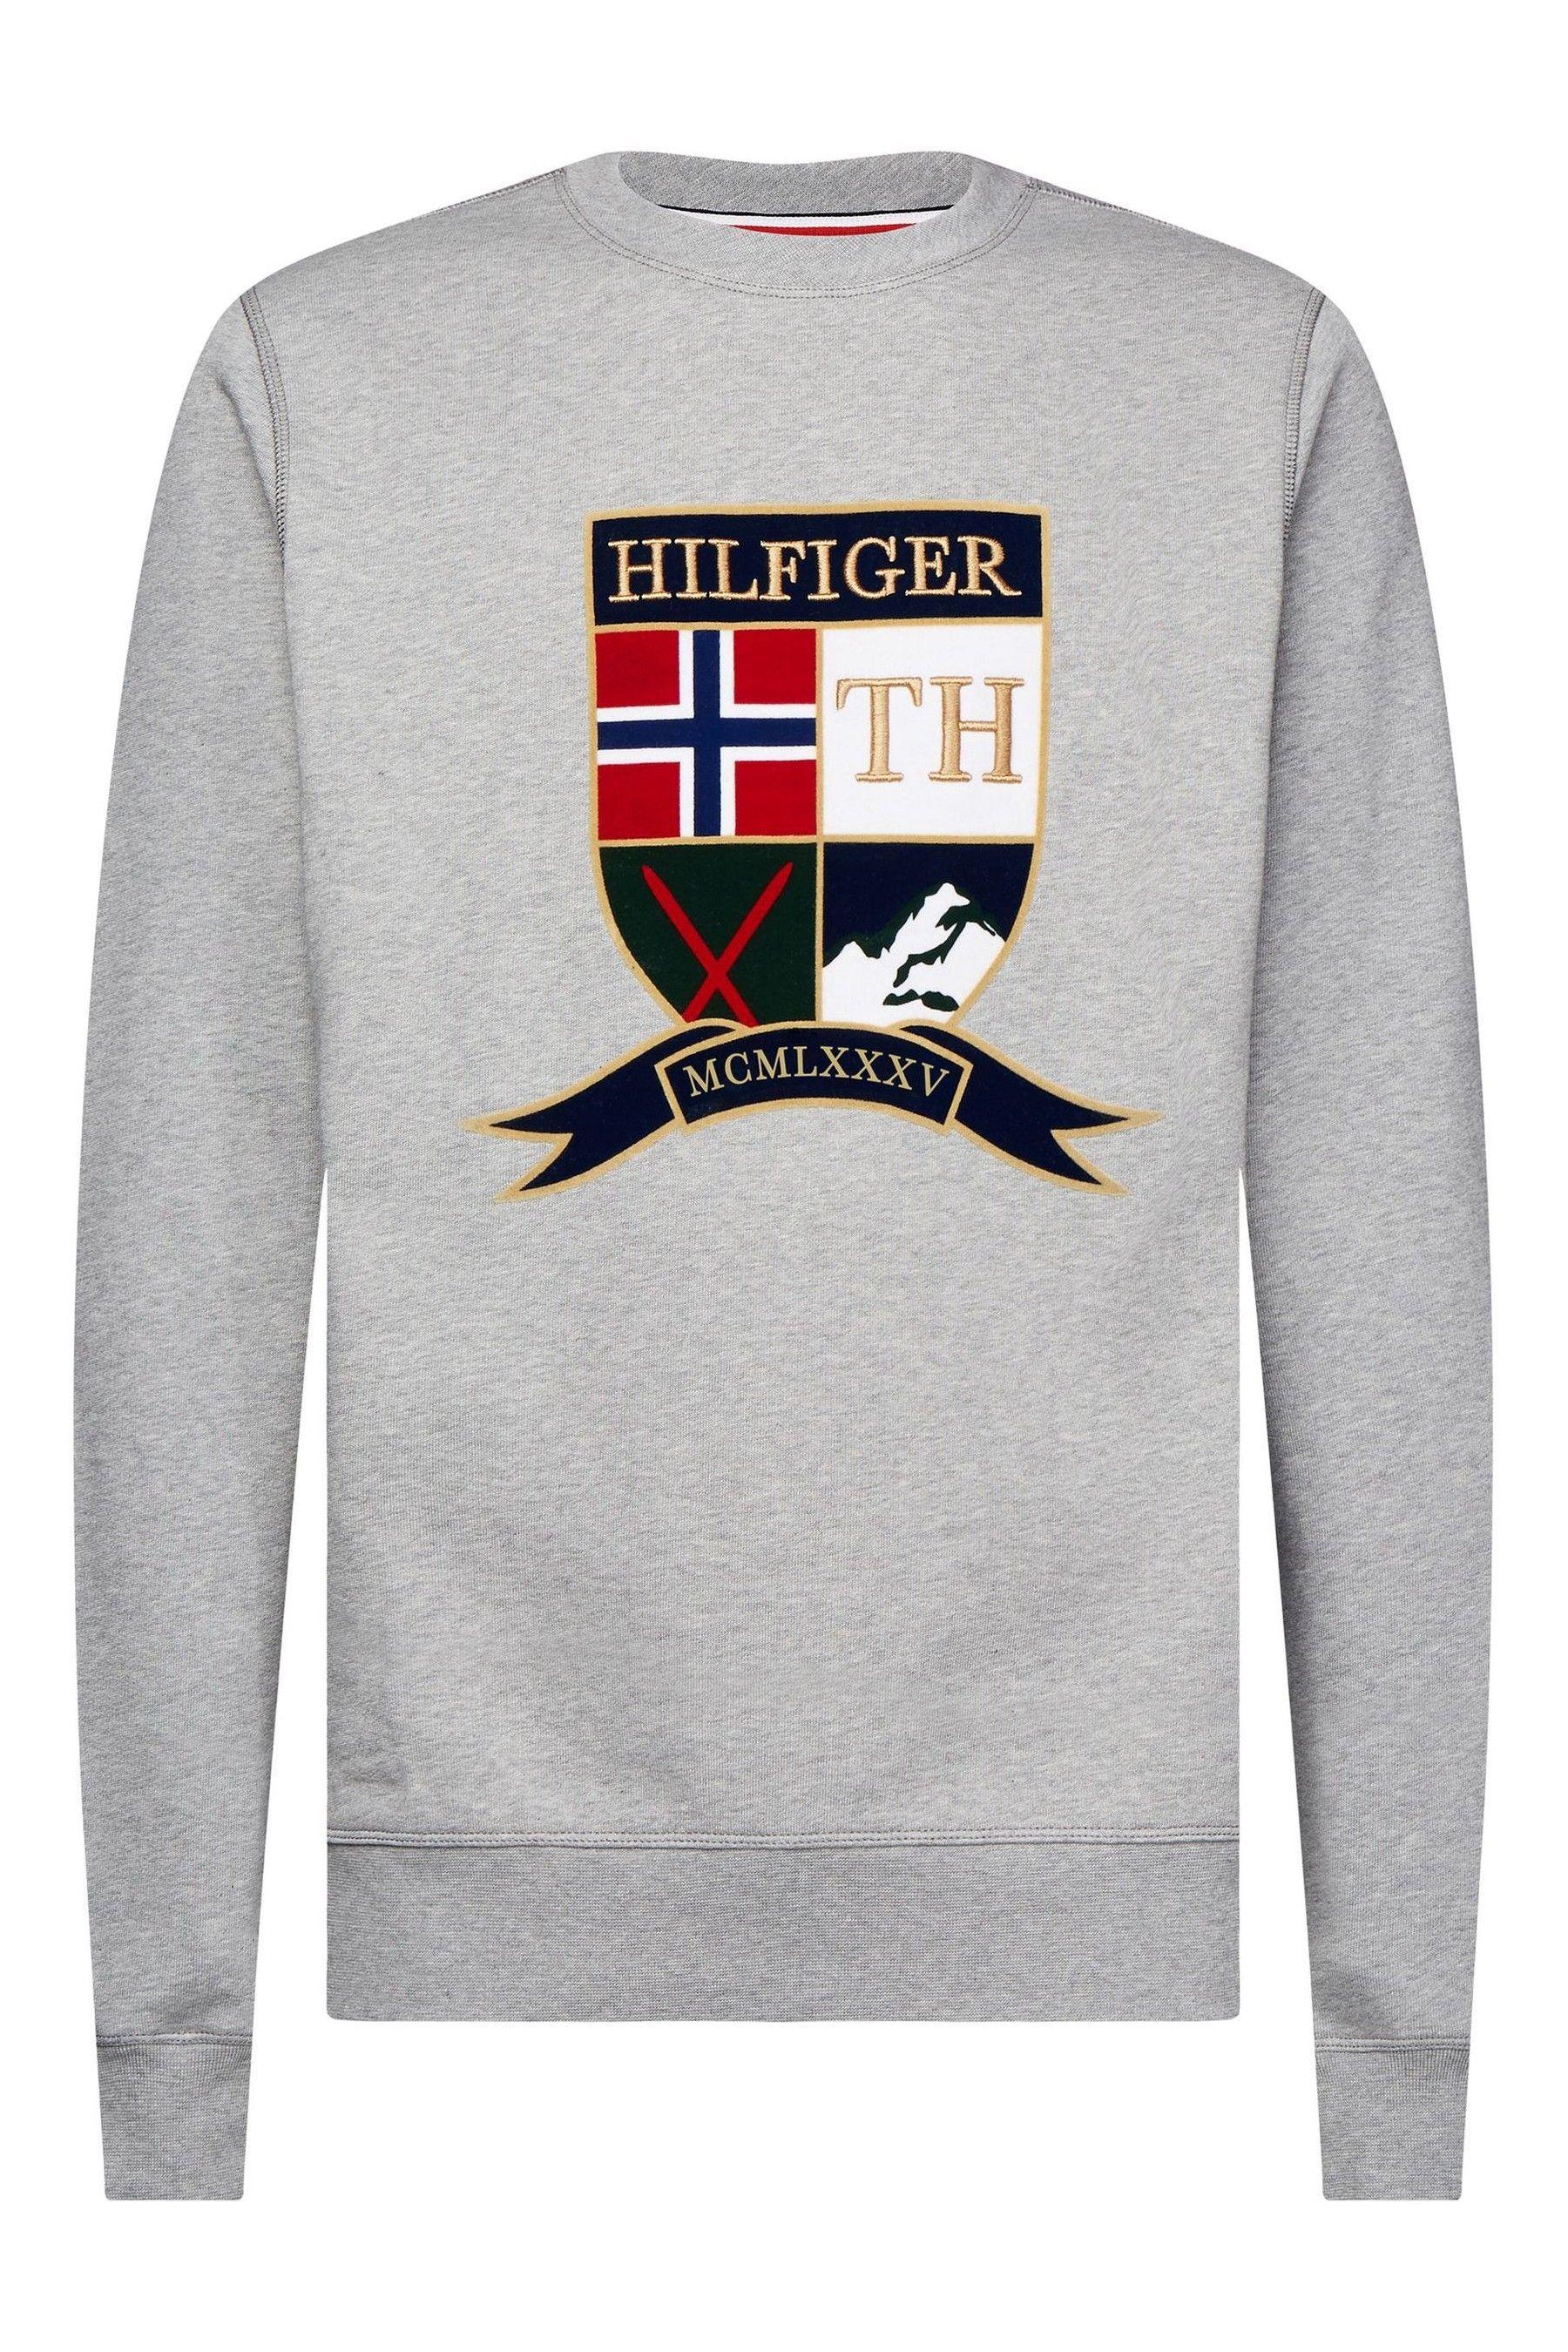 Mens Tommy Hilfiger Shield Artwork Sweatshirt Grey Ropa De Tommy Hilfiger Ropa Nike Sudaderas [ 2700 x 1800 Pixel ]